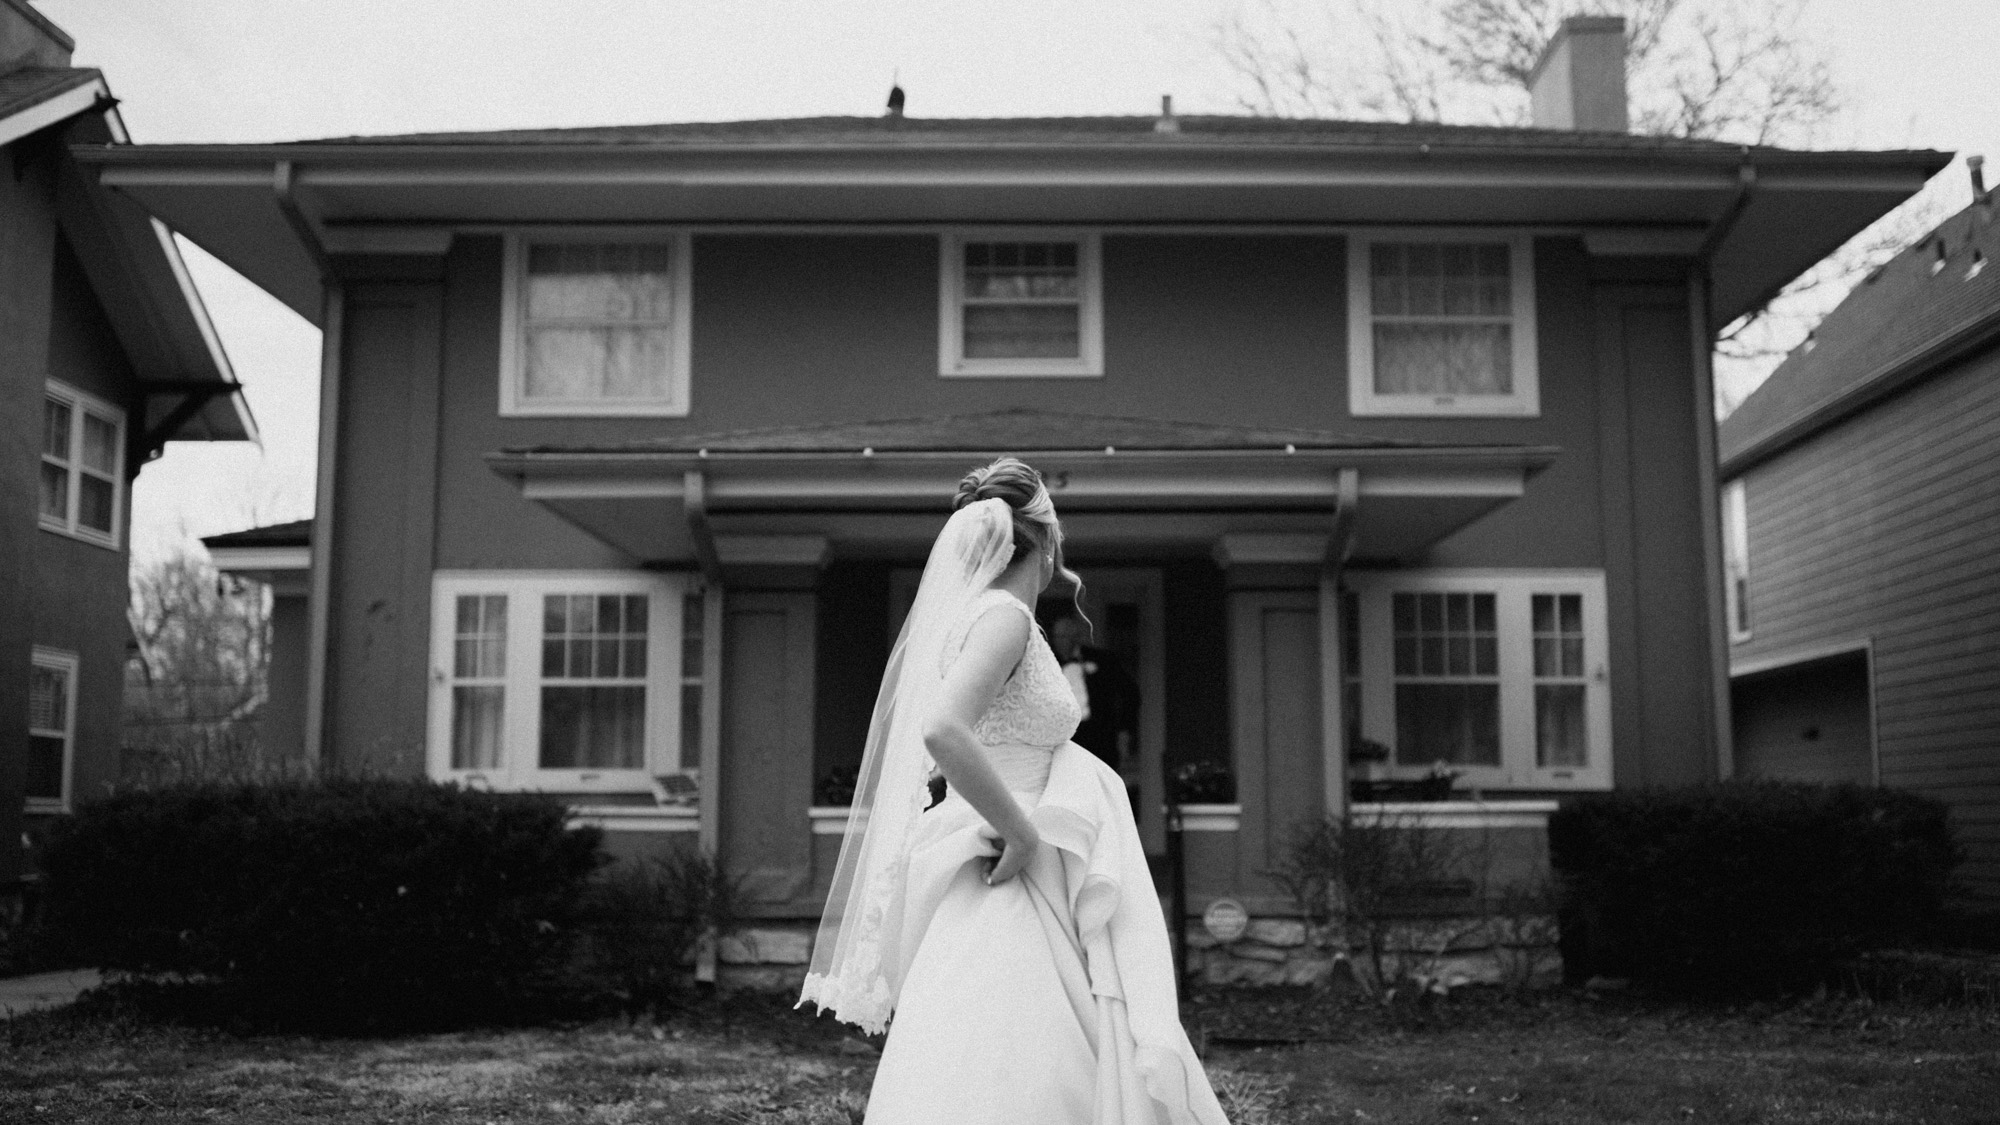 Alec_Vanderboom_kansas_city_hip_wedding_photos-0029.jpg